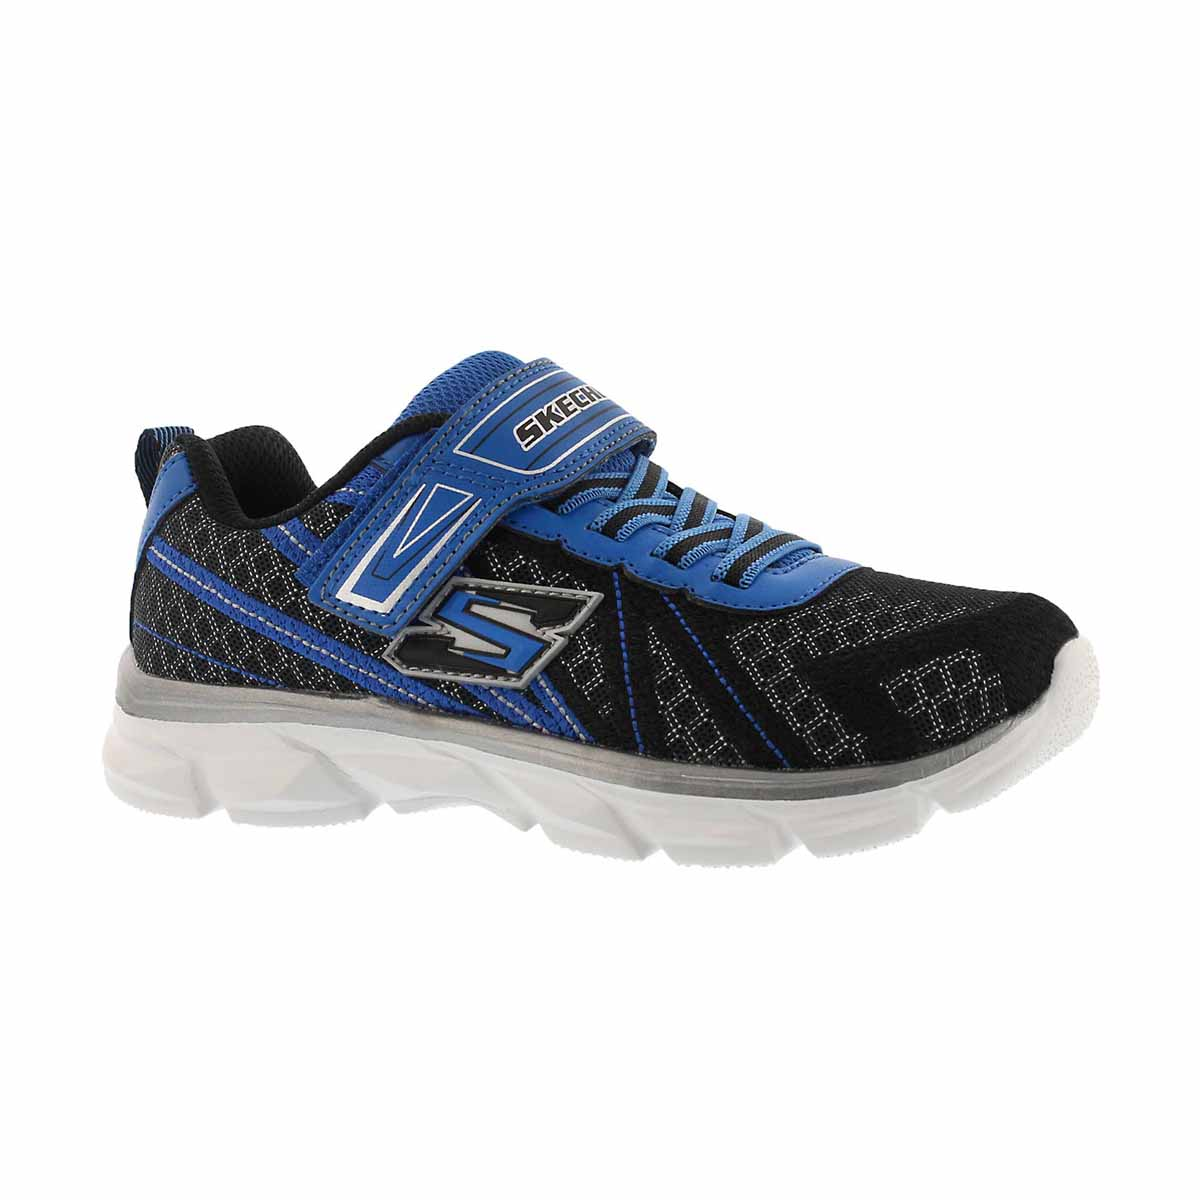 Boys' ADVANCE black/blue sneakers